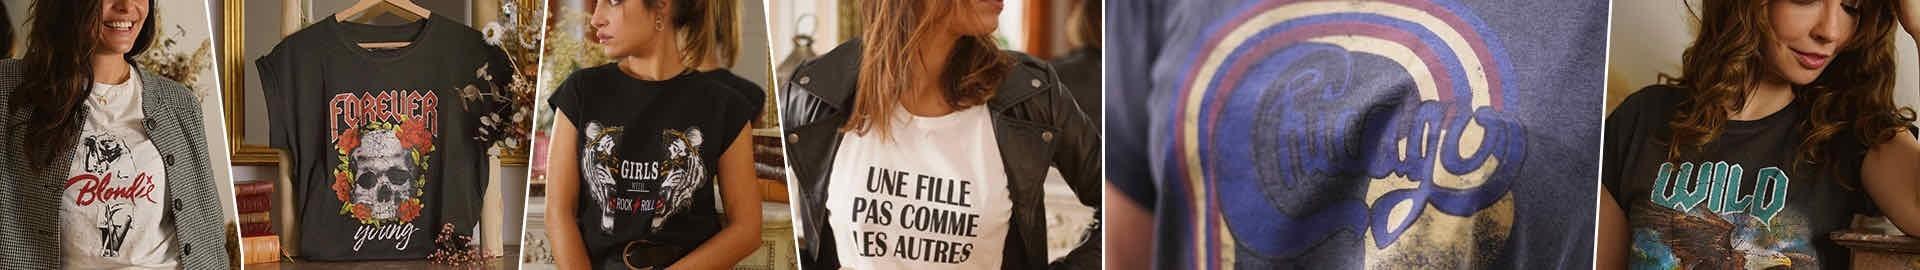 T-shirts | Les Impertinentes